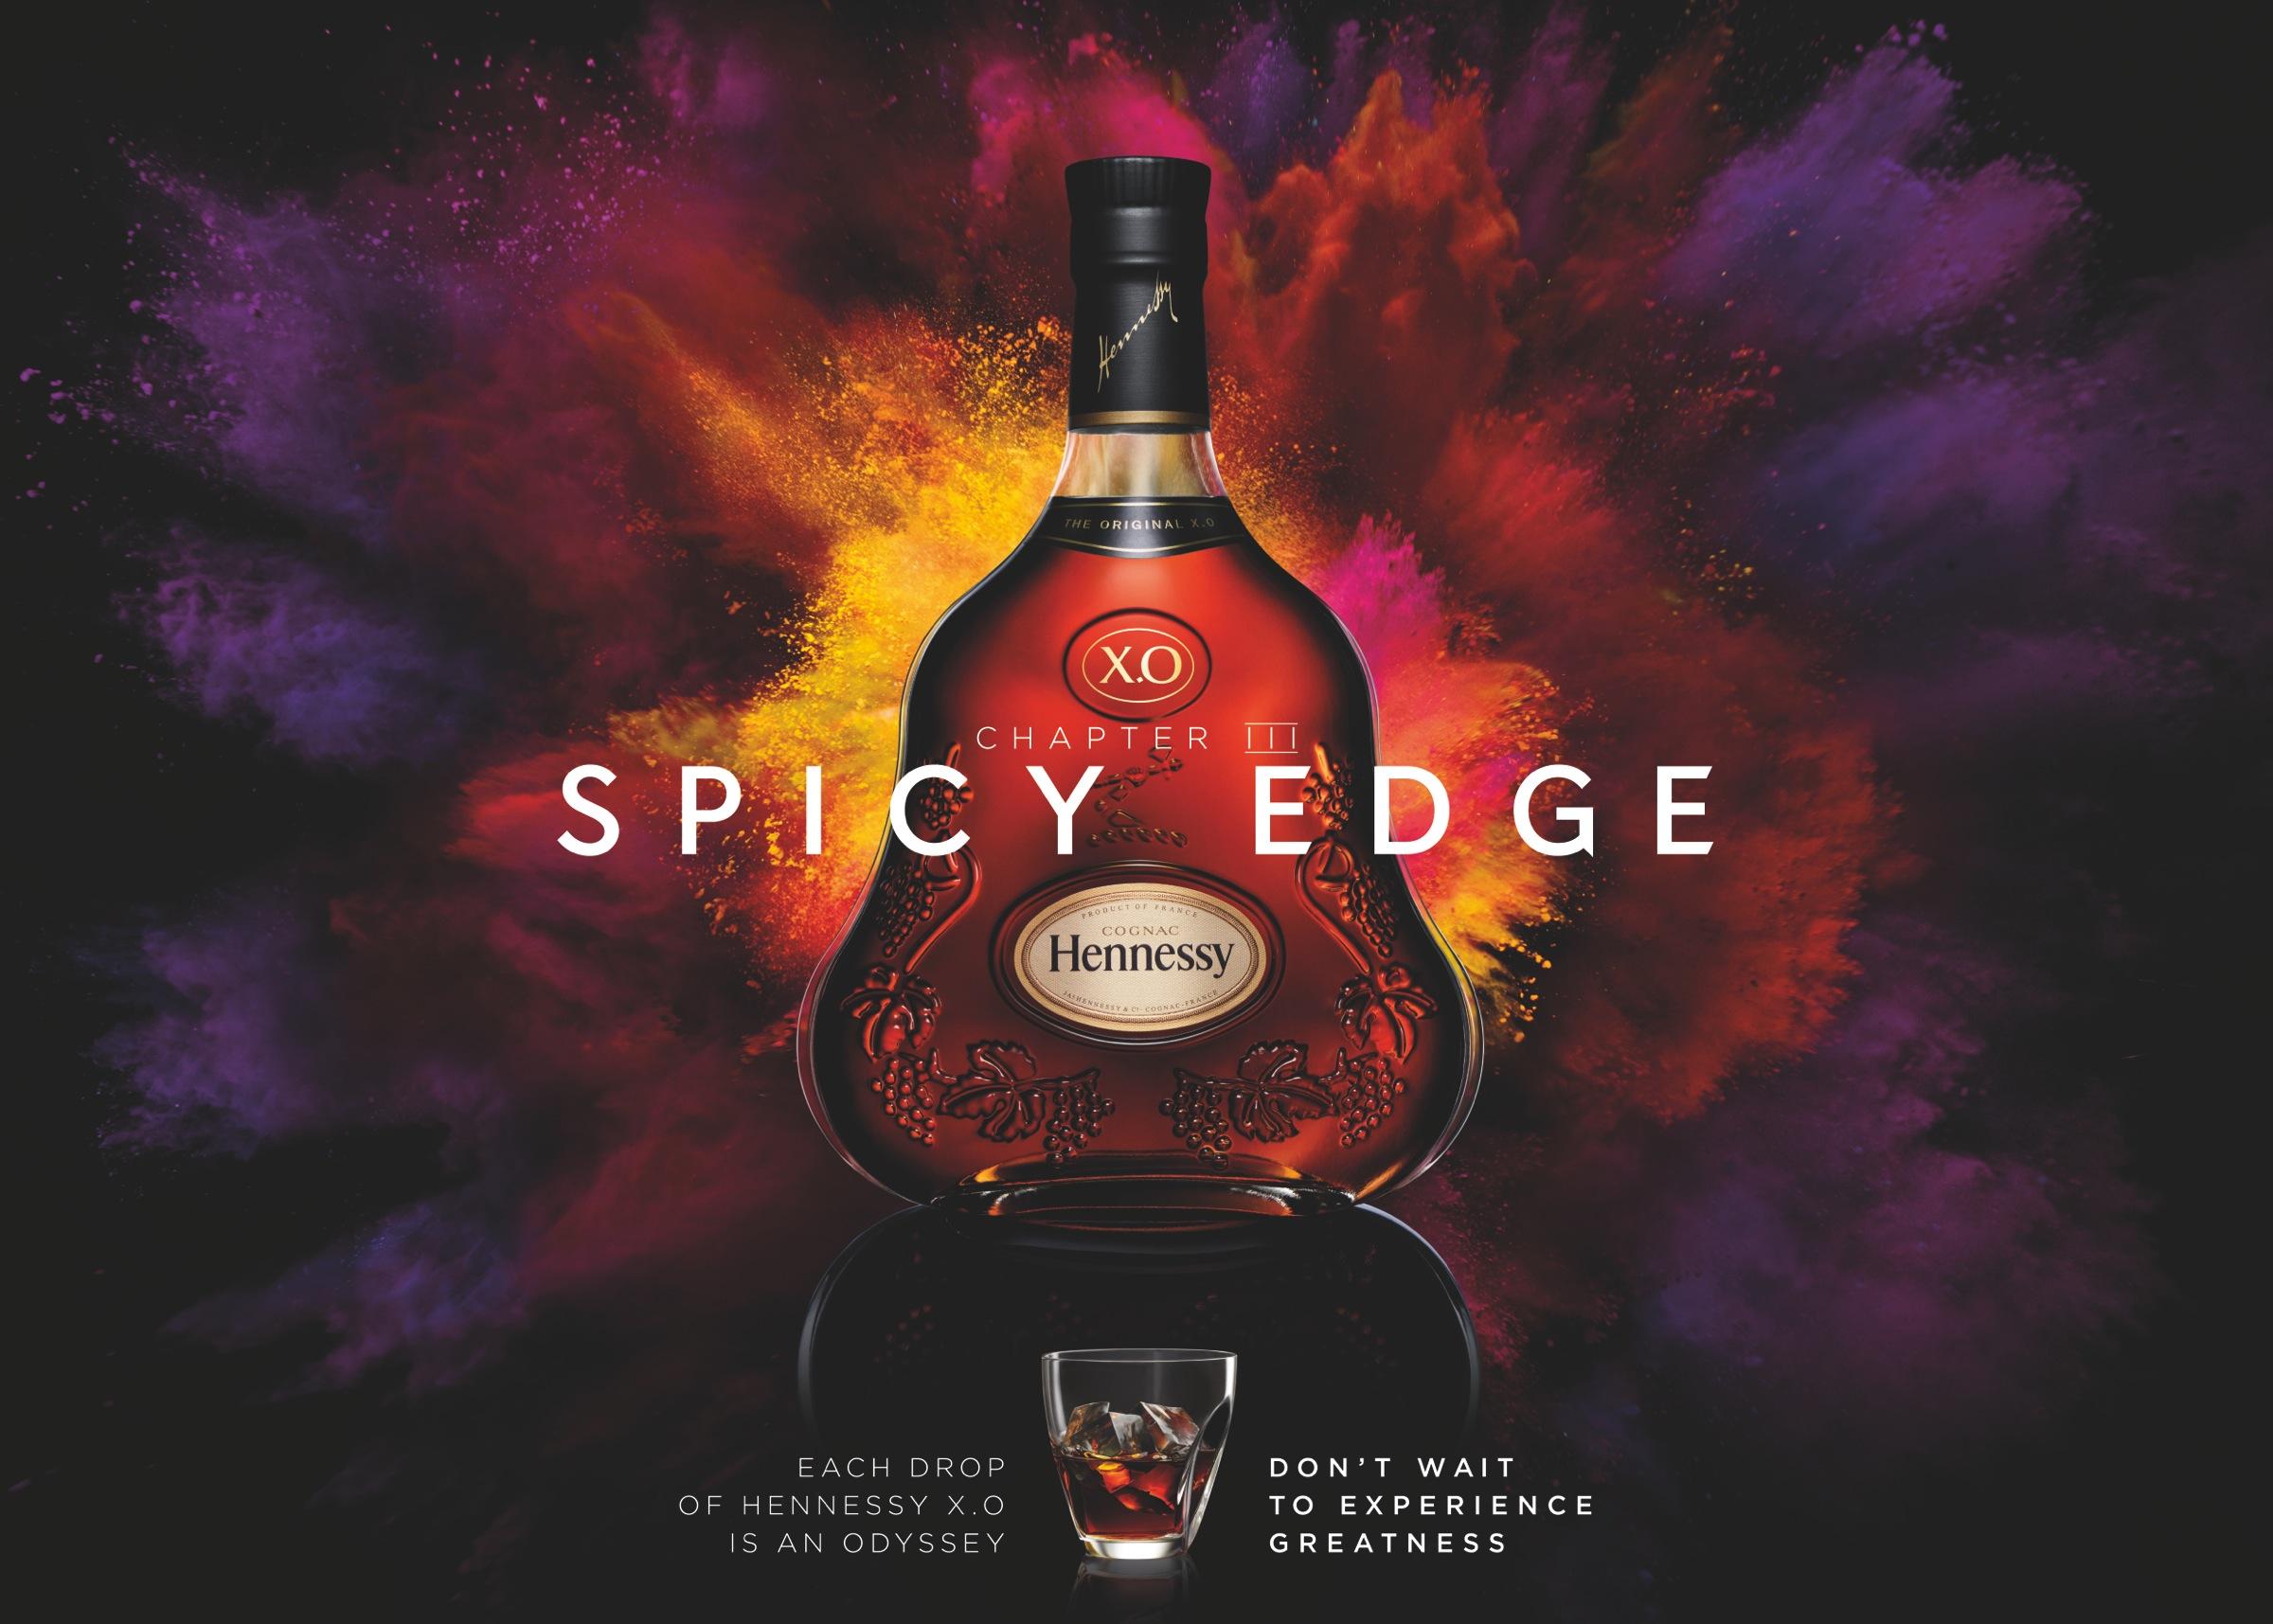 hennessy-xo-cognac-odyssey-ads-marketing-publicite-agence-ddb-paris-4